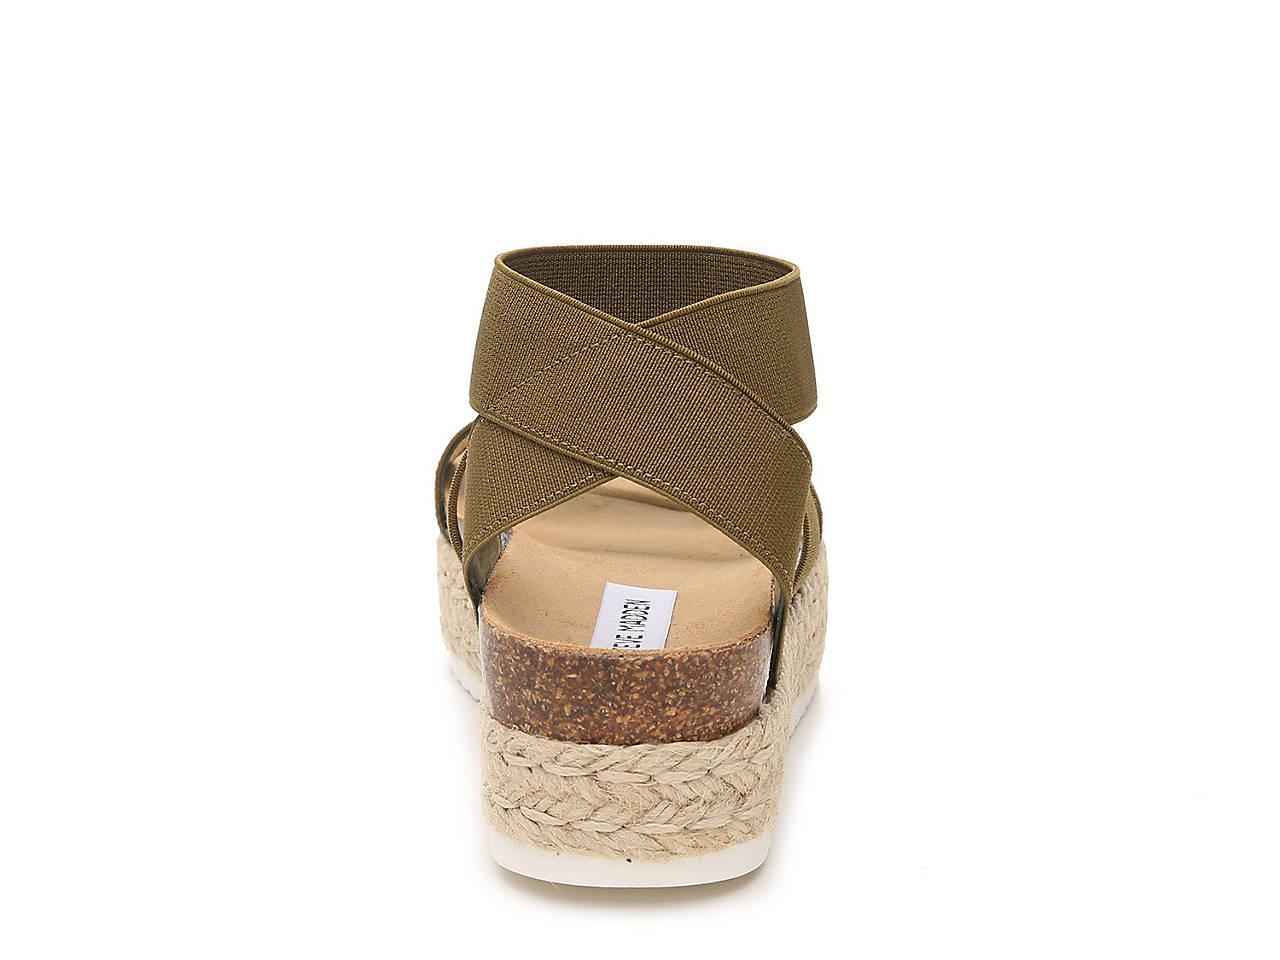 b9f6e95faa1 Steve Madden Kimmie Espadrille Wedge Sandal Women s Shoes